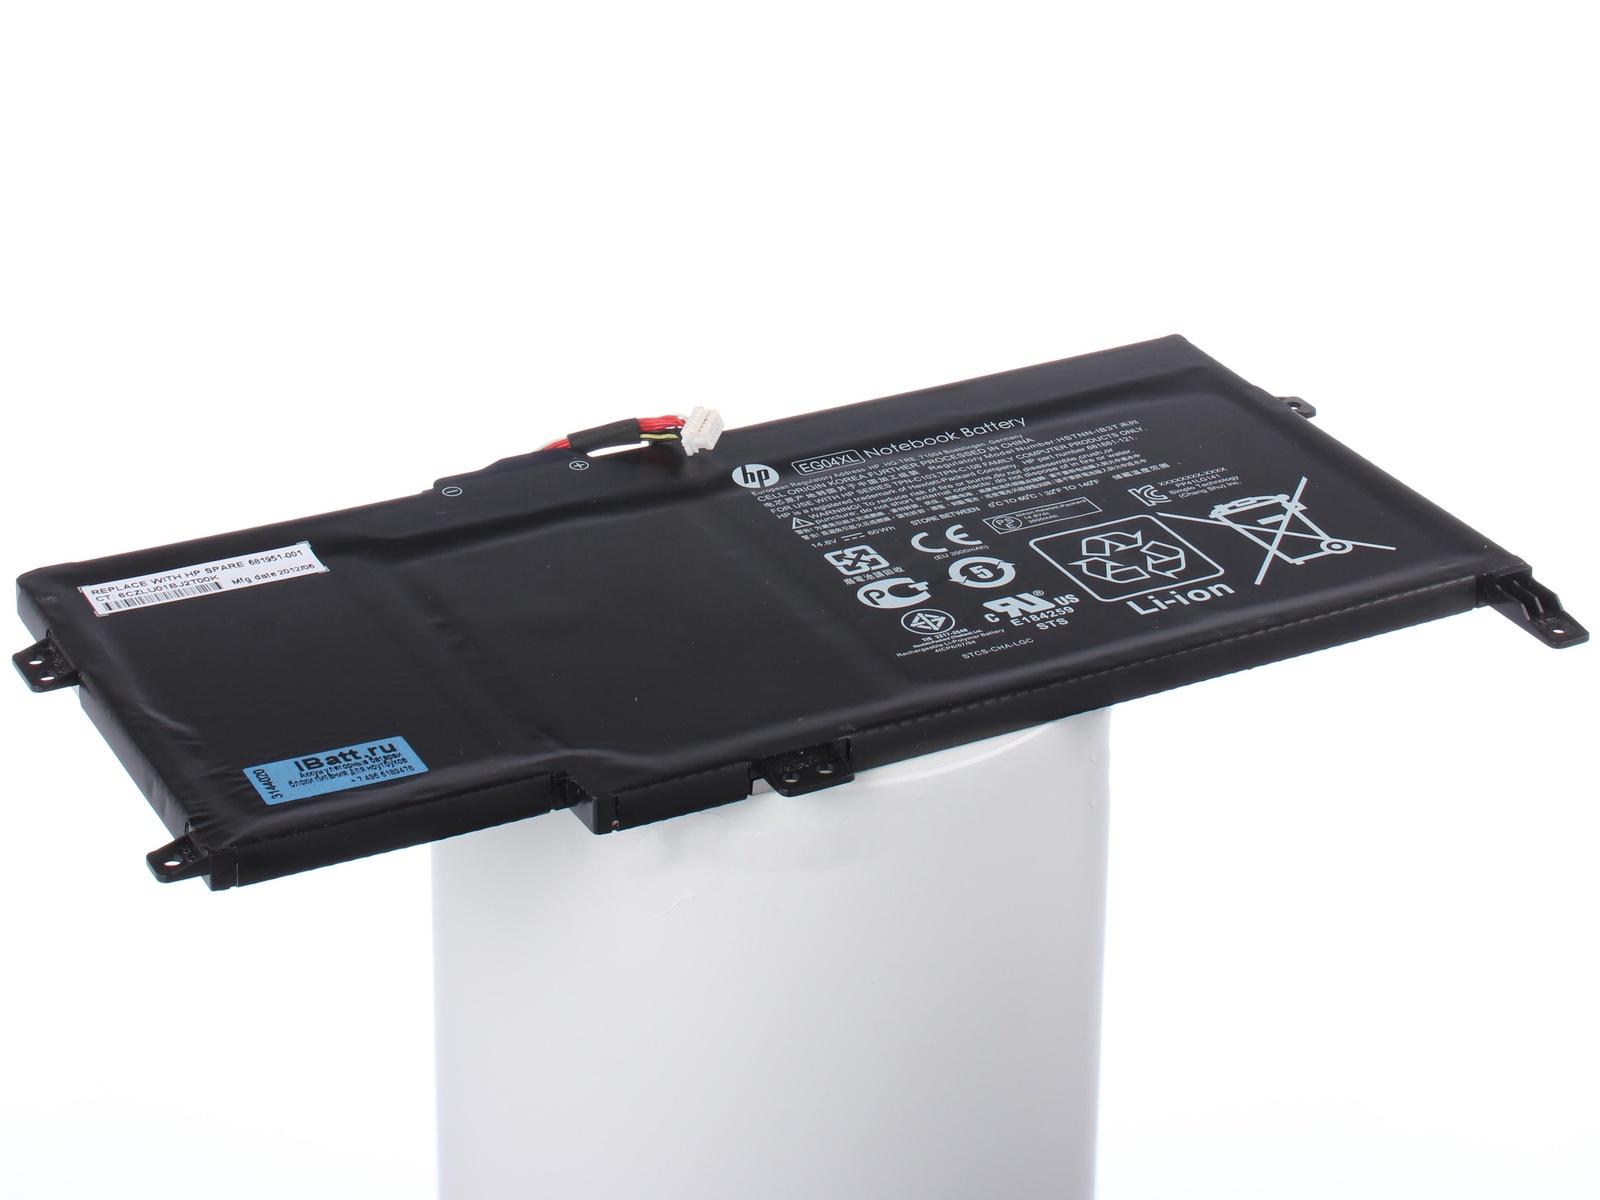 Аккумулятор для ноутбука iBatt для HP-Compaq Envy 6-1170sf, ENVY Ultrabook 6-1170sf, ENVY Sleekbook 6-1150er, Envy 6-1058er, ENVY Ultrabook 6-1253er, Envy 6-1051er, Envy 6-1250er, ENVY Sleekbook 6-1110sw, ENVY Ultrabook 6-1051er цена